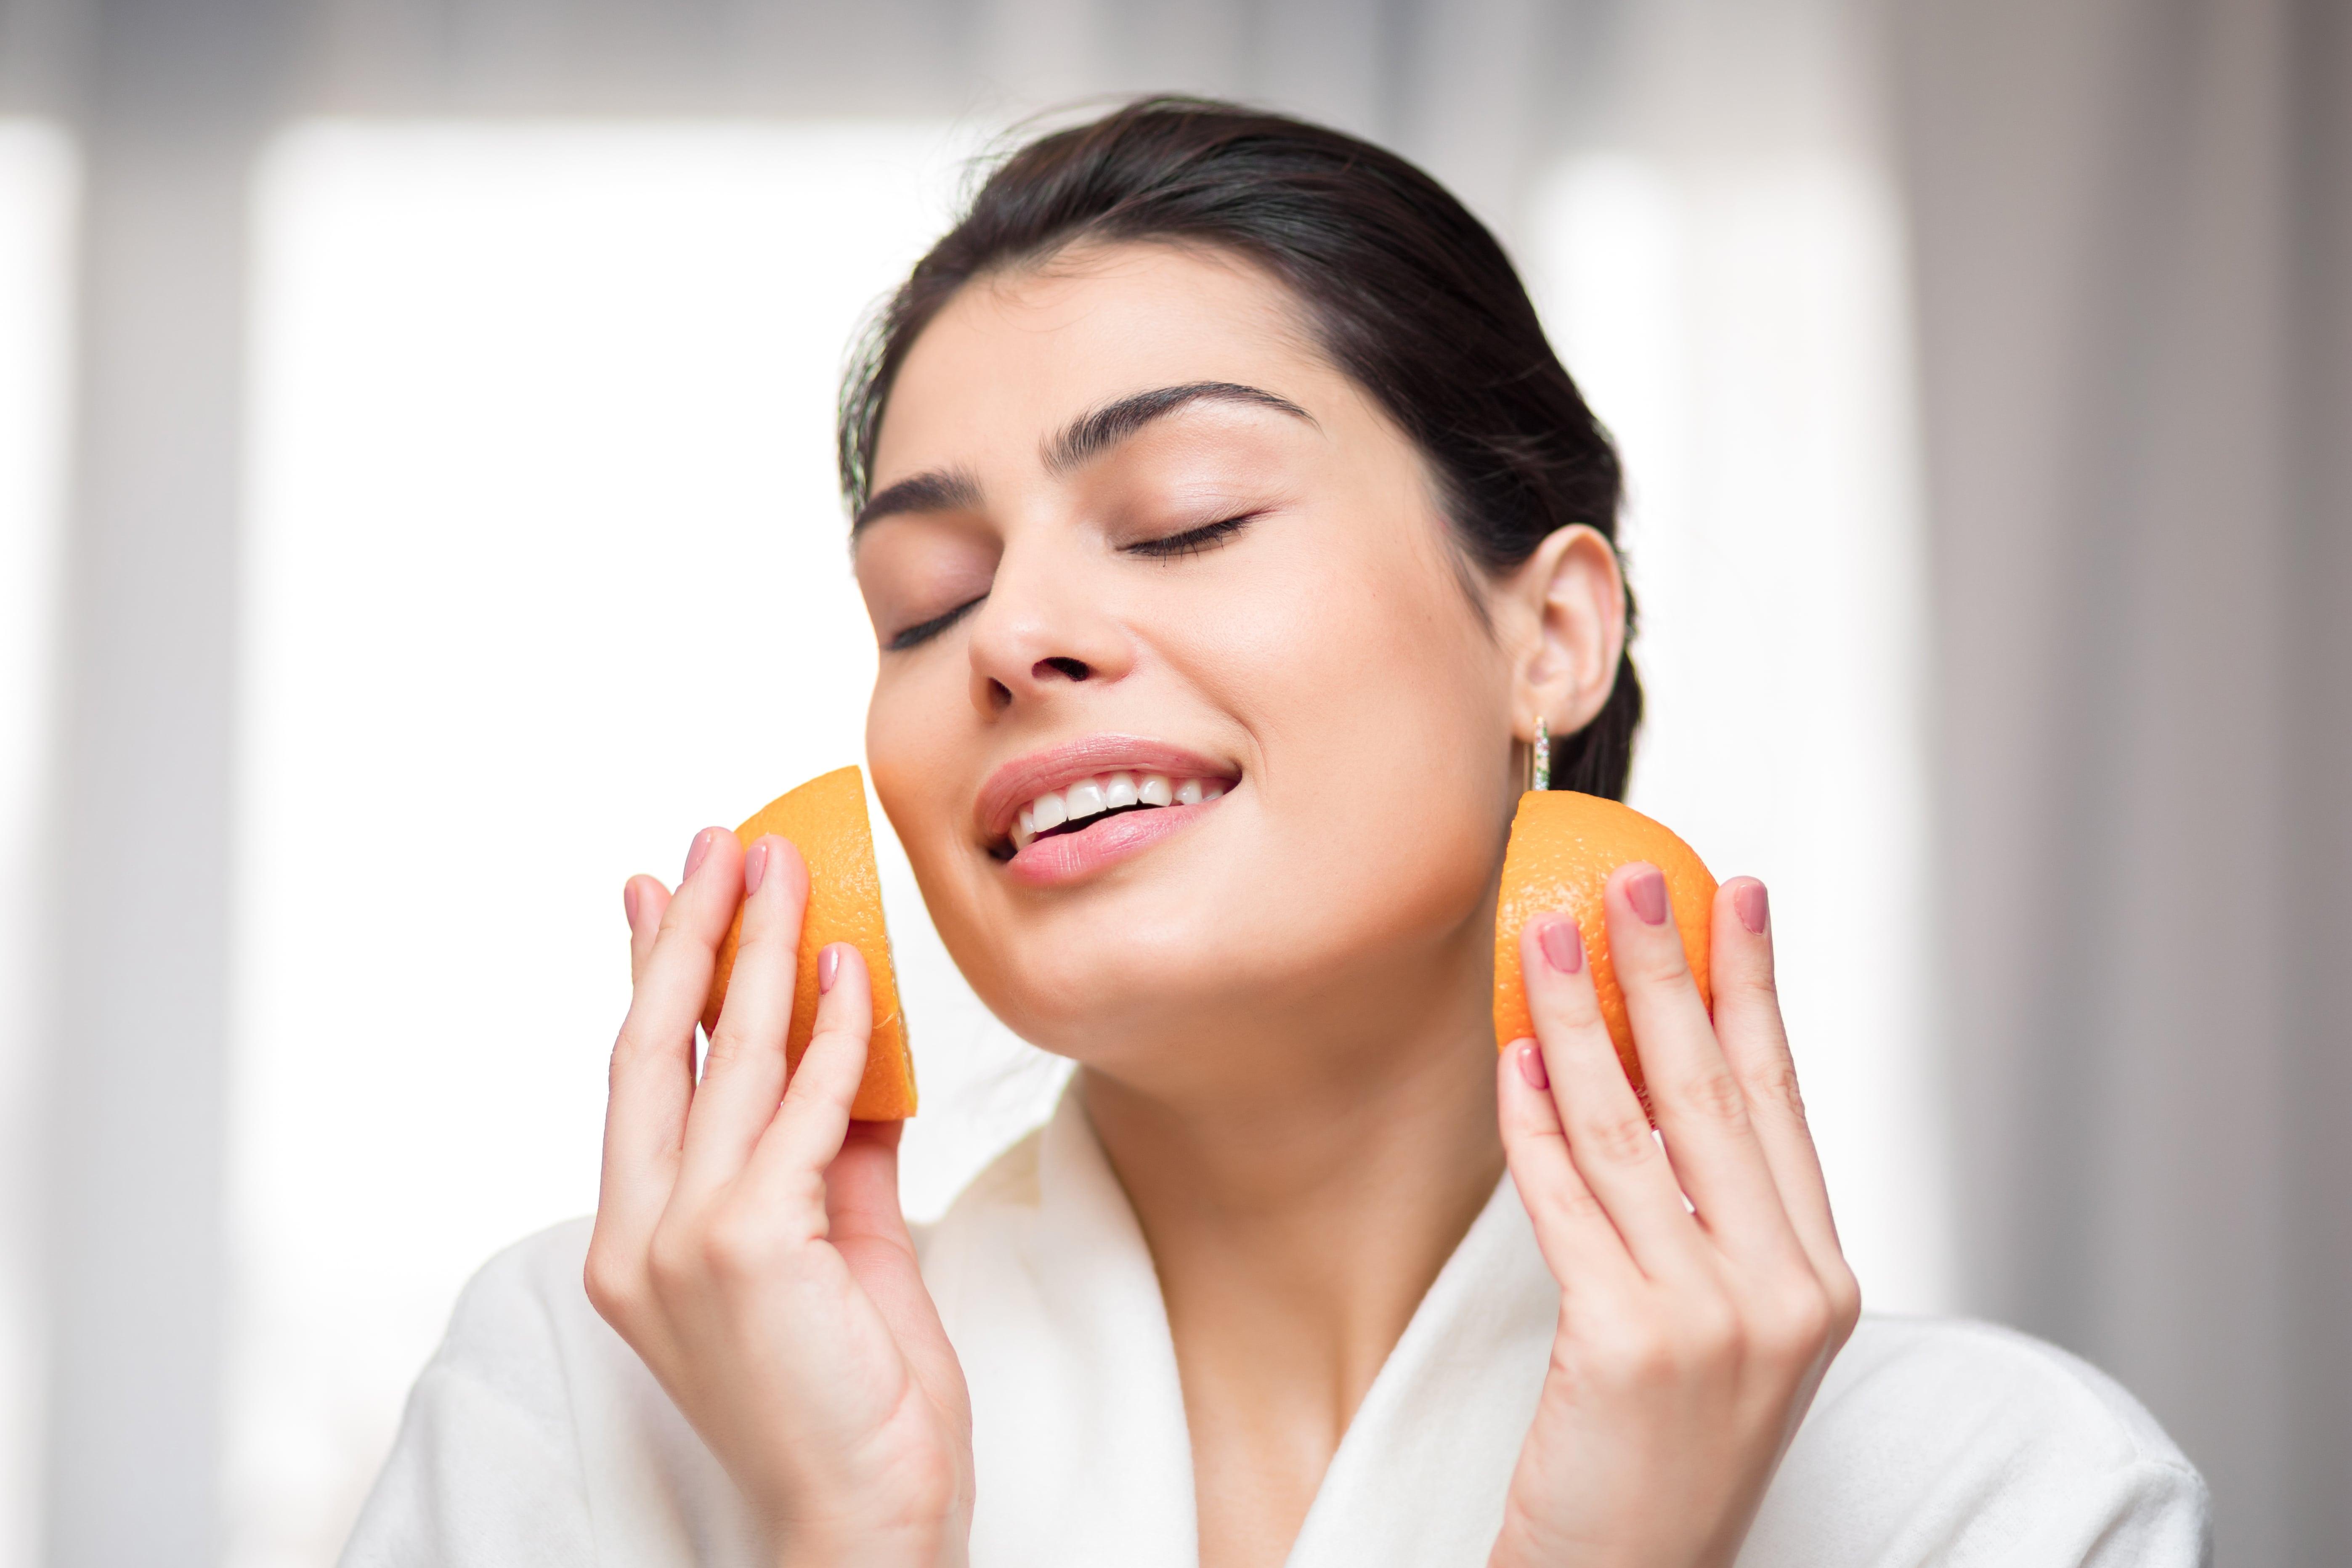 kozmeticki tretman ili savet 1-min